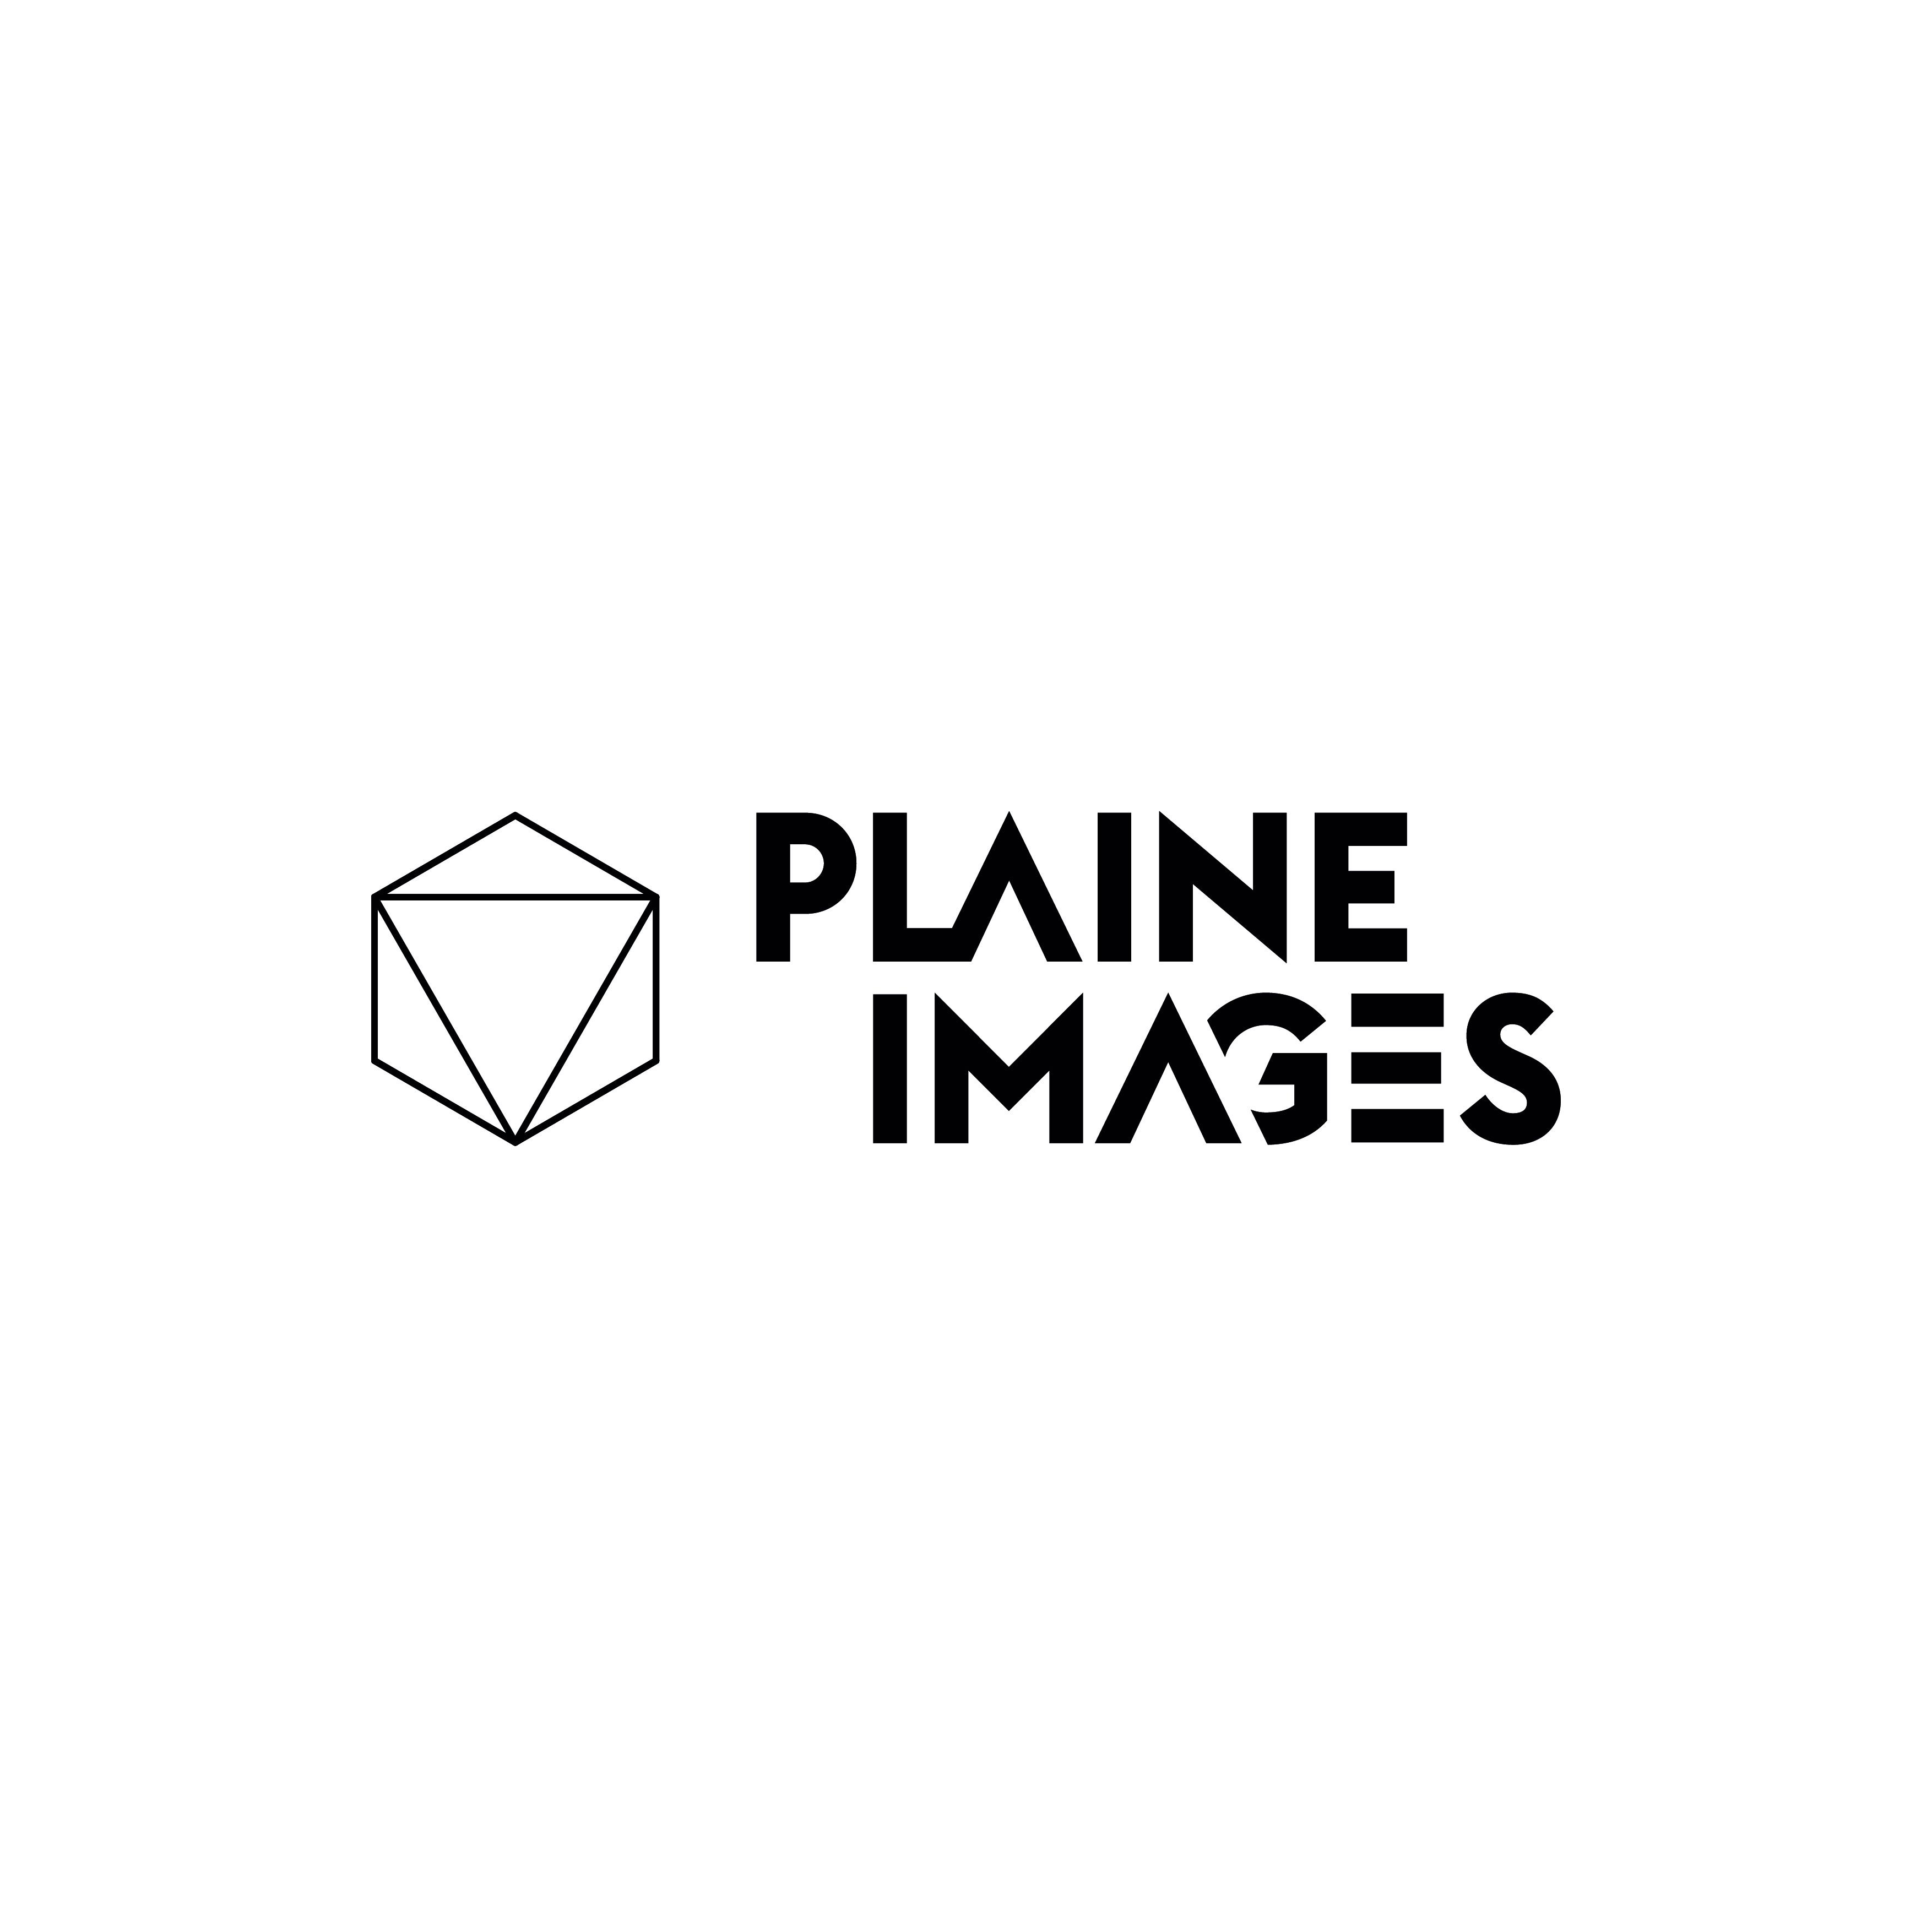 Logo_plaine_images_-44_converted.jpg